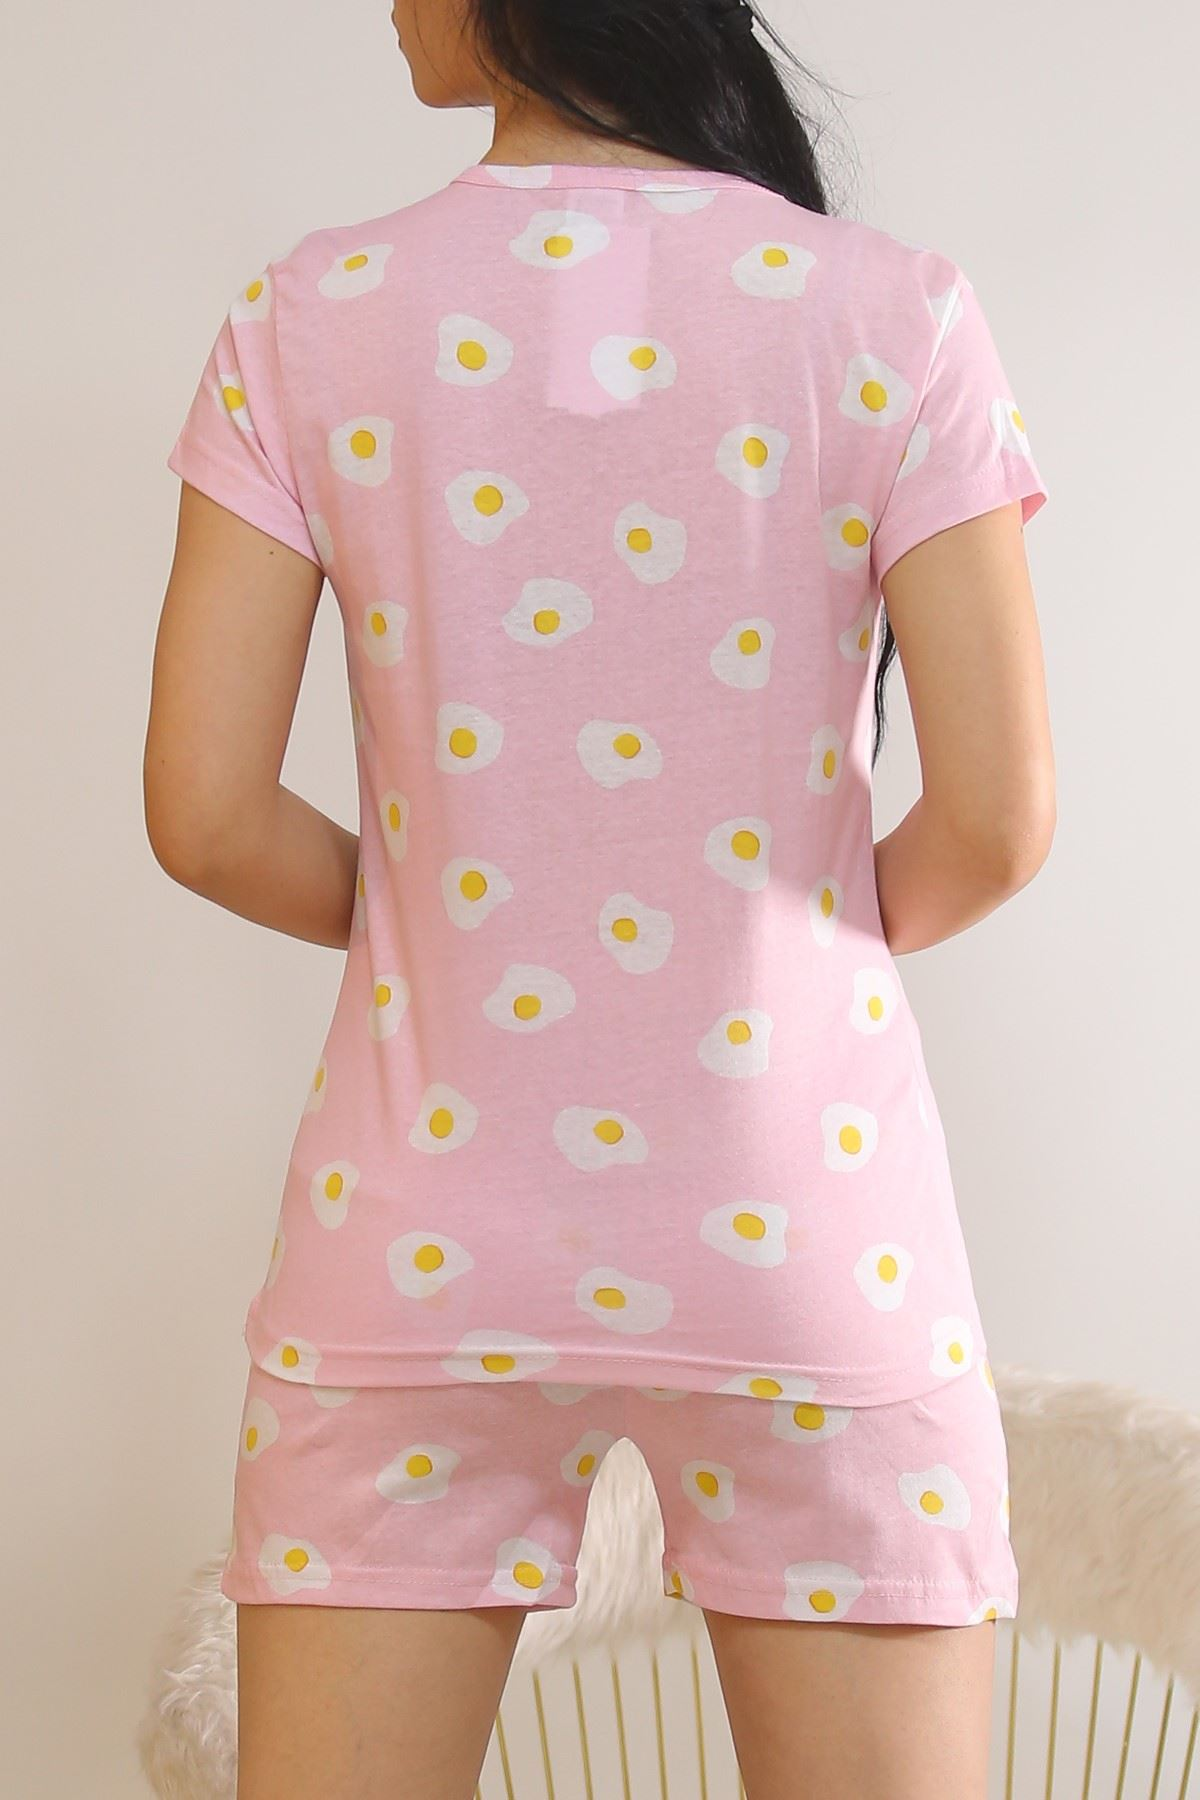 Şortlu Pijama Takımı Pembe1 - 5995.1287.